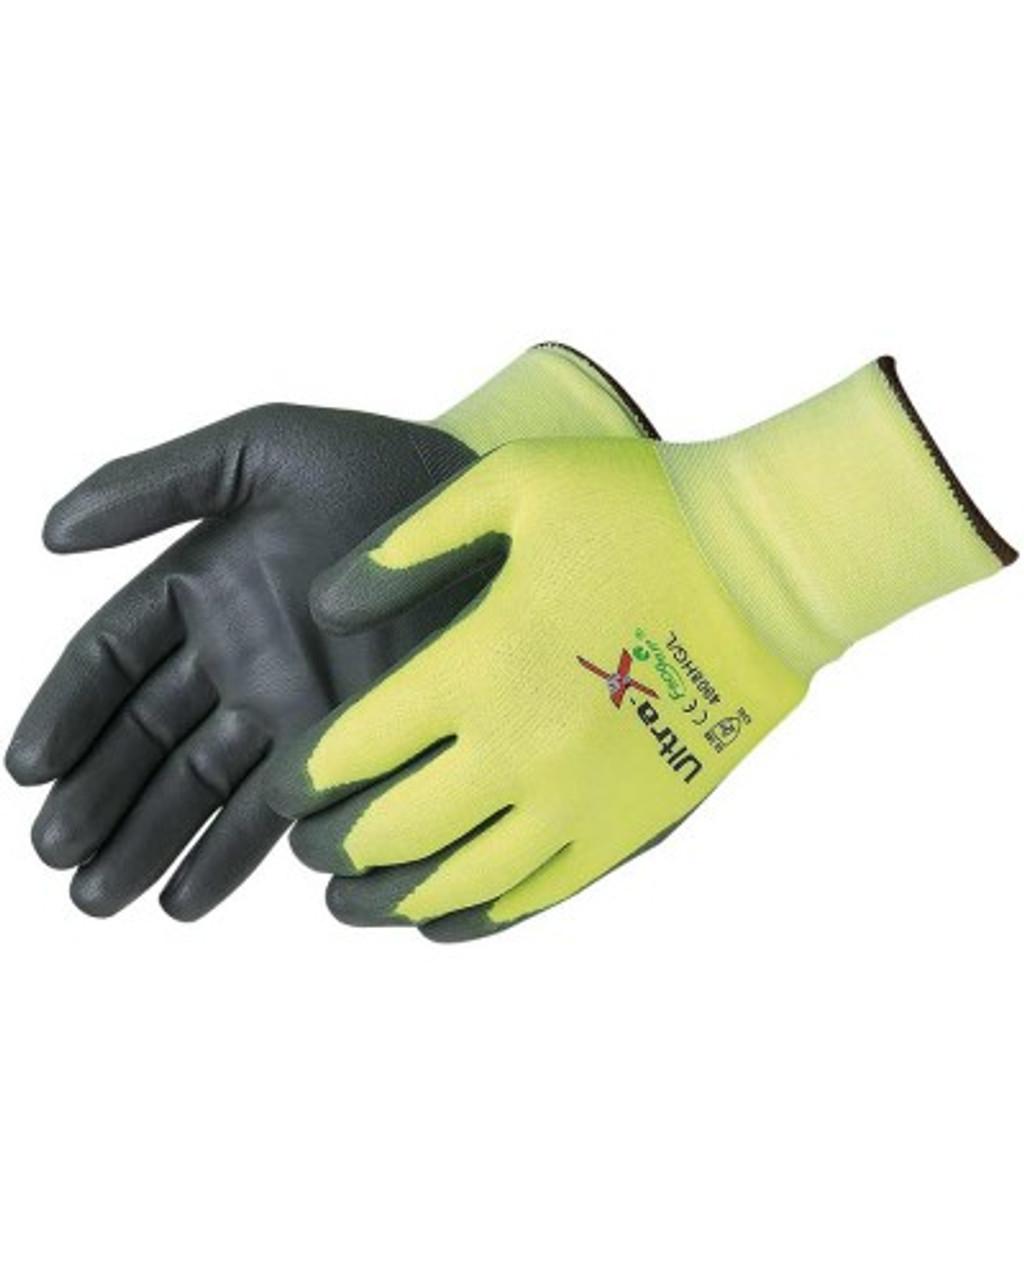 ANSI A2 - Ultra X-Grip Cut Resistant Gray Polyurethane Palm Coated ## 4908HG ##